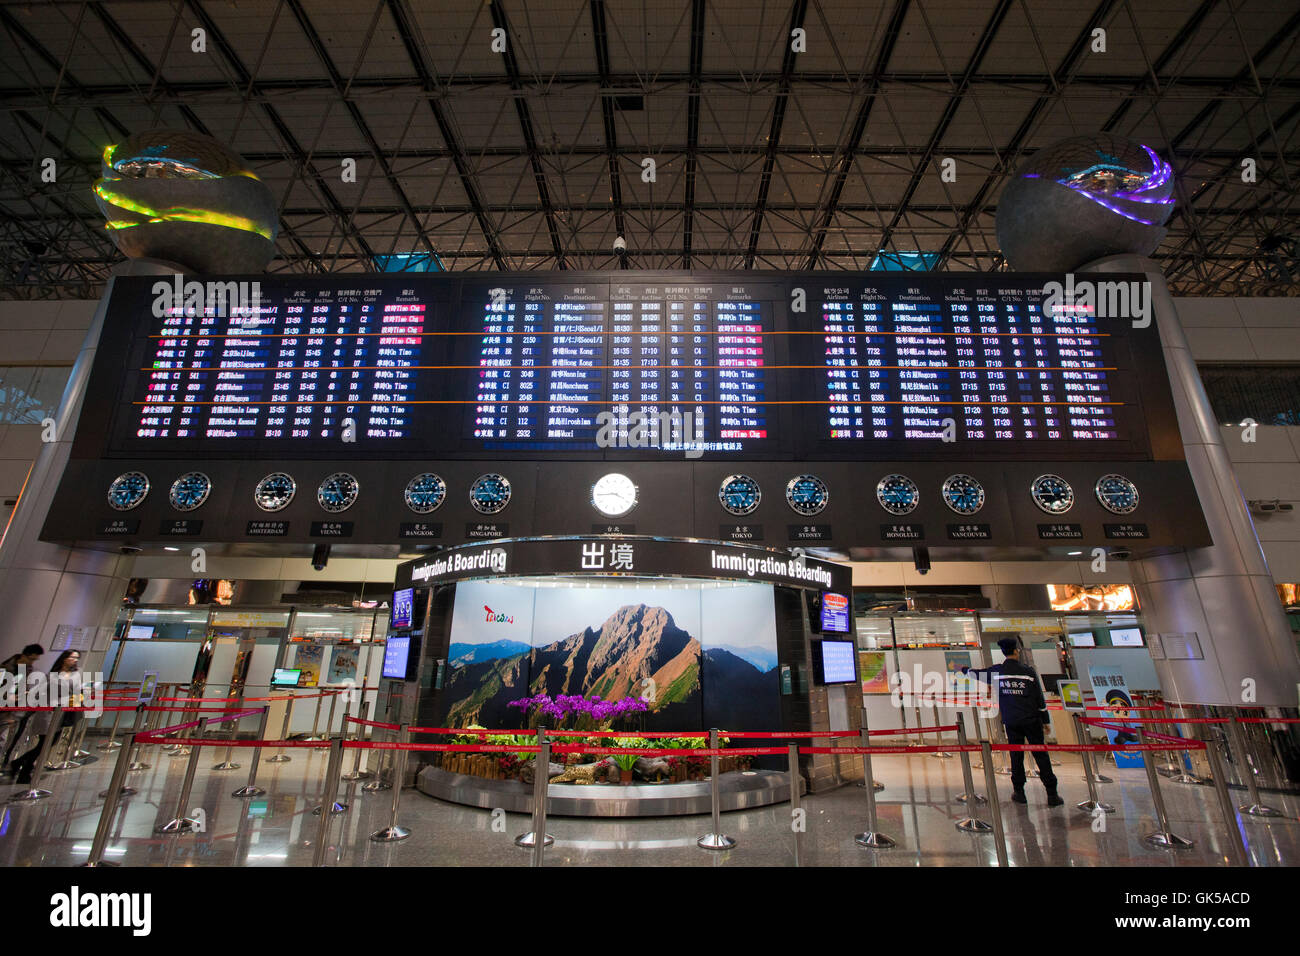 Taiwan Taoyuan International Airport - Stock Image